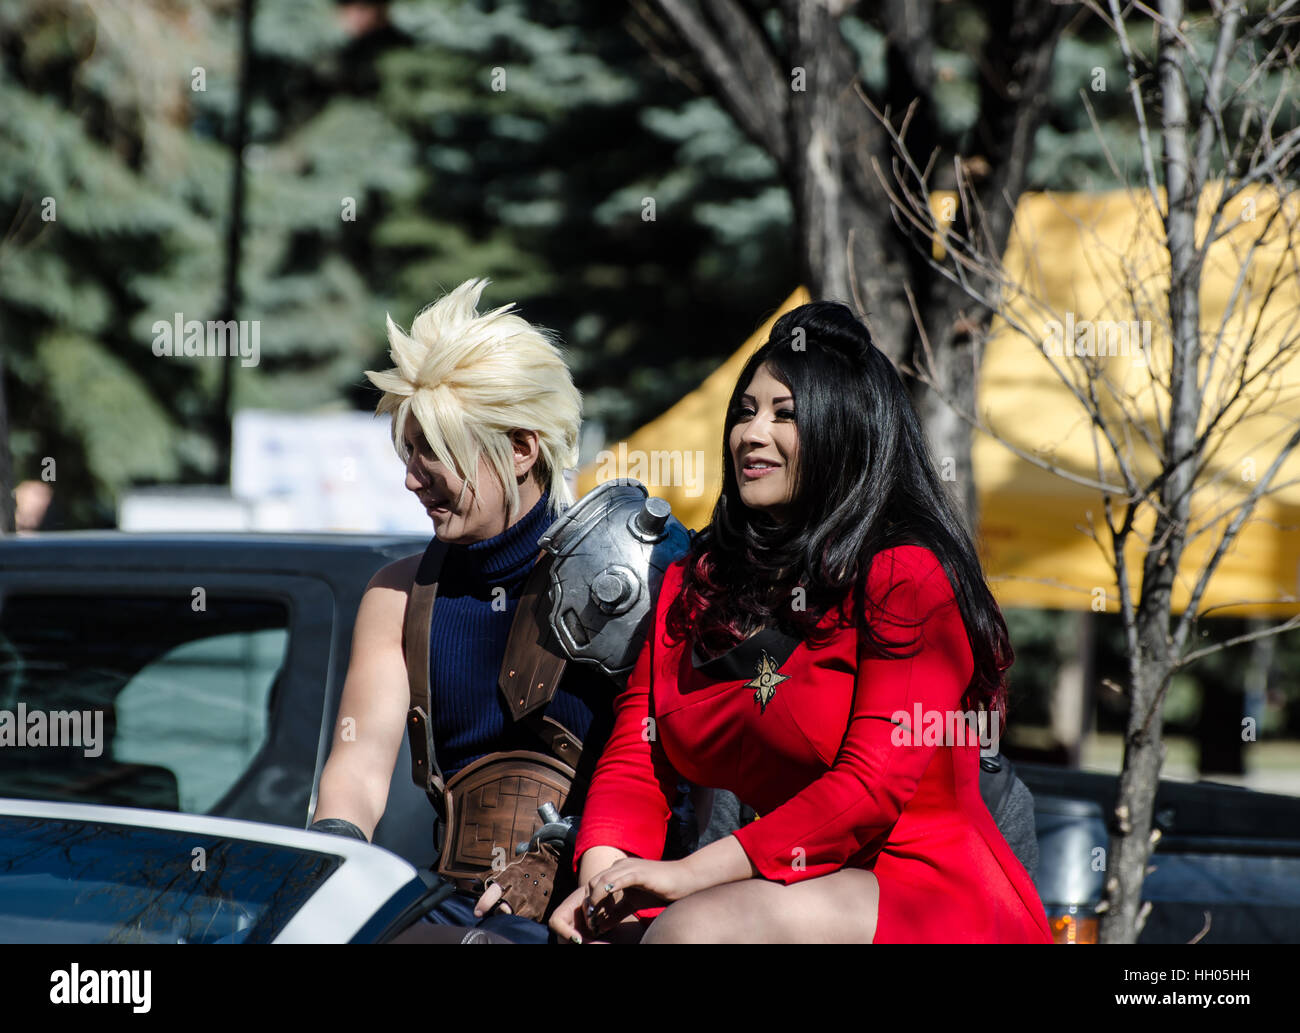 Calgary, Alberta, Canada - April 17 2015: Star Trek and Final Fantasy cosplay at the parade of wonders Calgary Comic - Stock Image